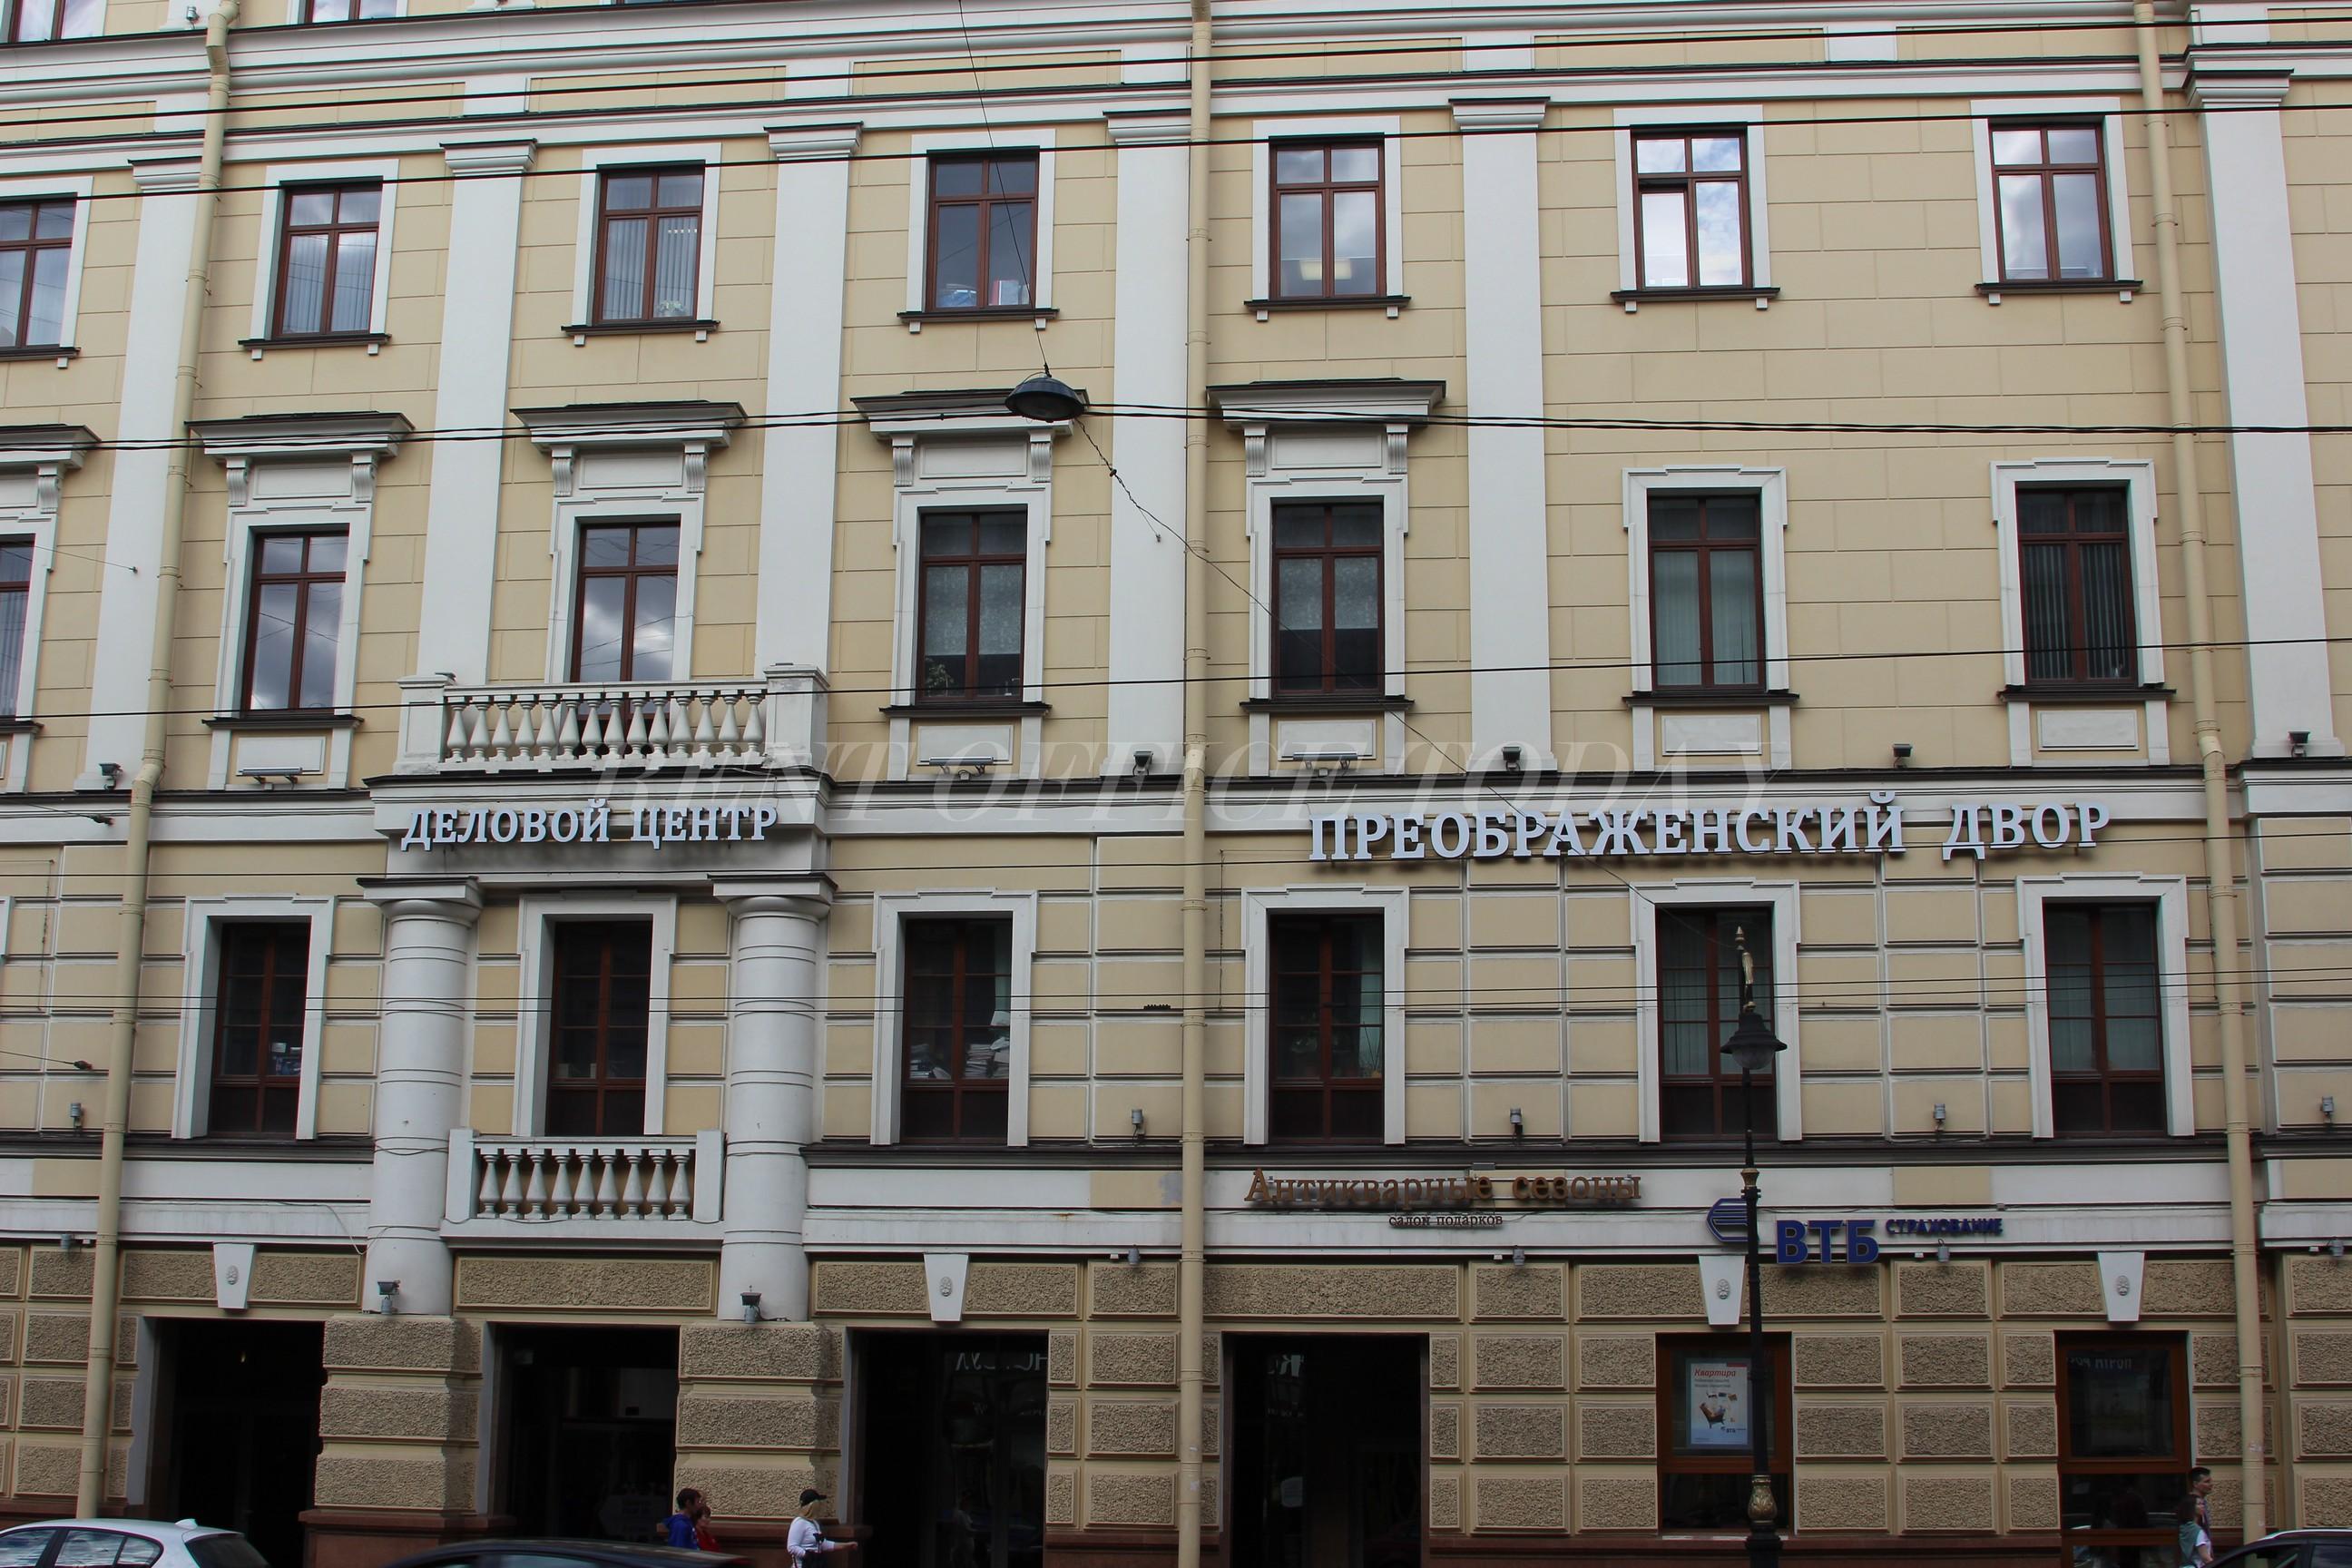 преображенский-двор-3